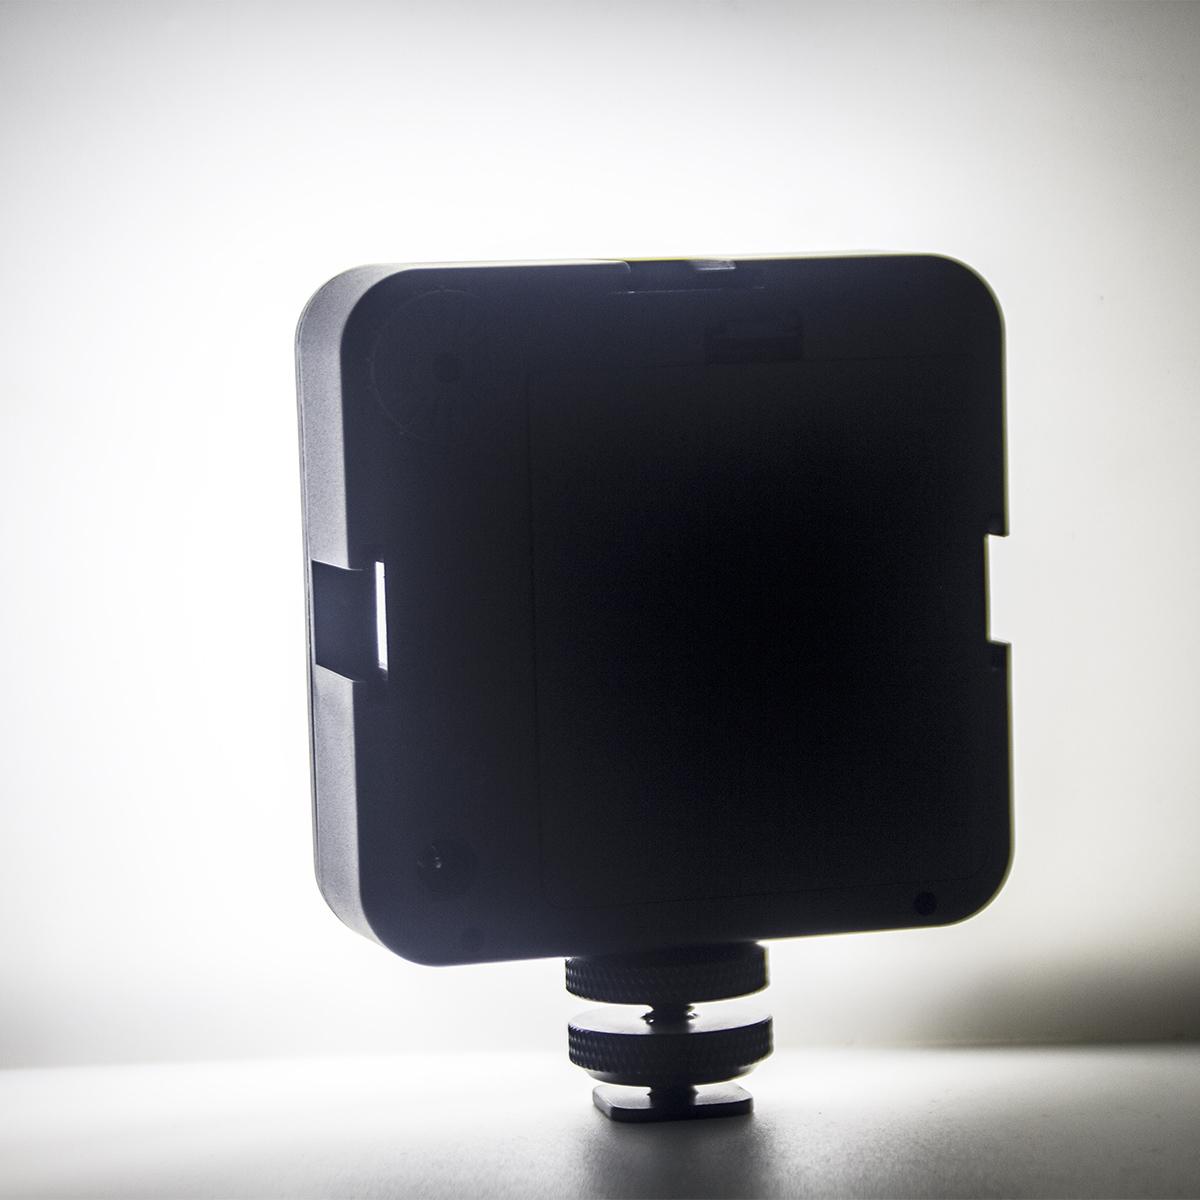 64 LED Video Light for DSLR Camera Camcorder mini DVR as Fill Light for Wedding News Interview Macrophotography black